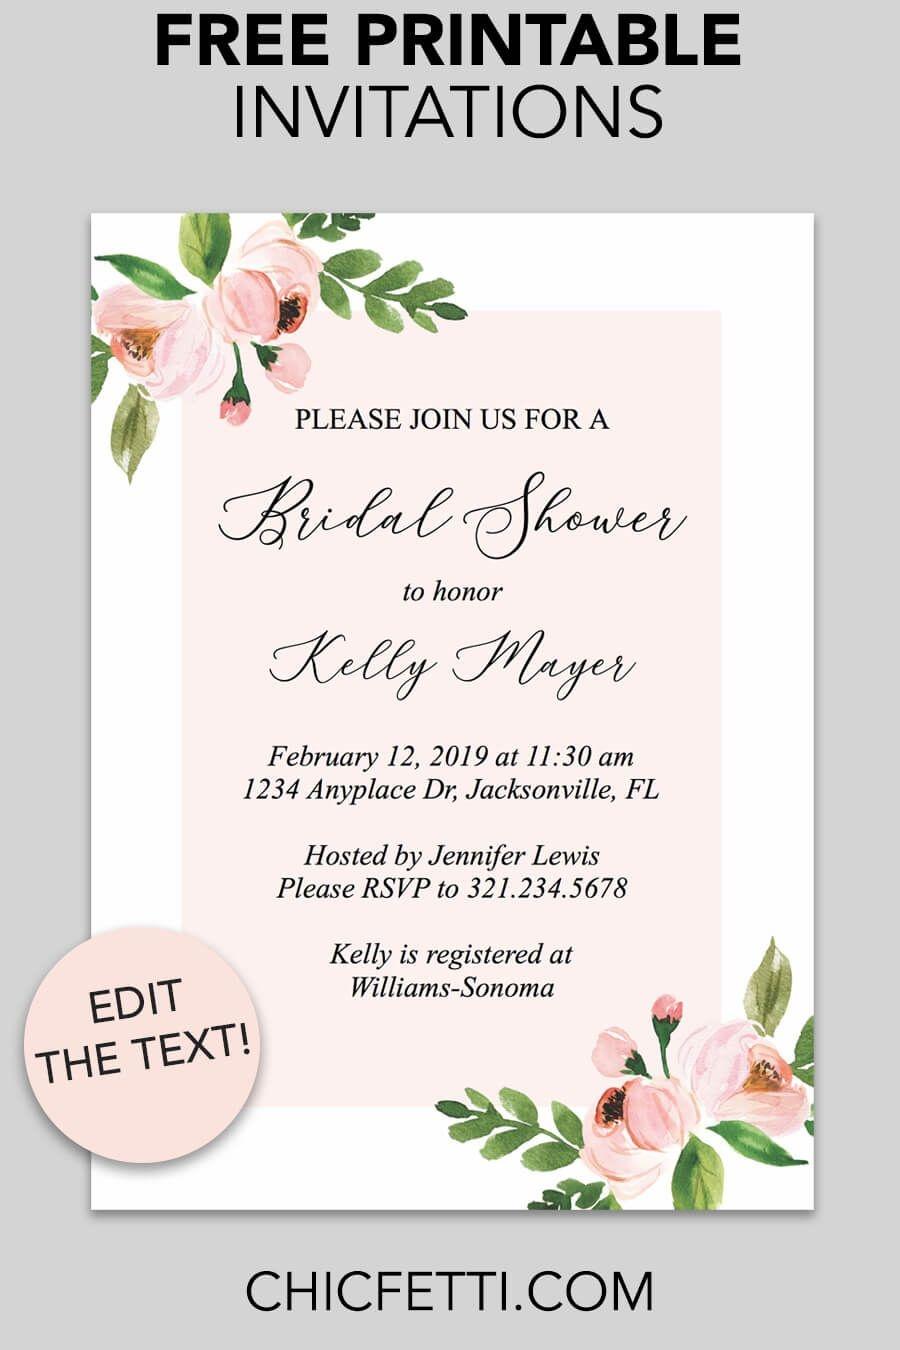 Bridal Shower Printable Invitation (Light Pink Floral   Free - Invitations Bridal Shower Free Printable